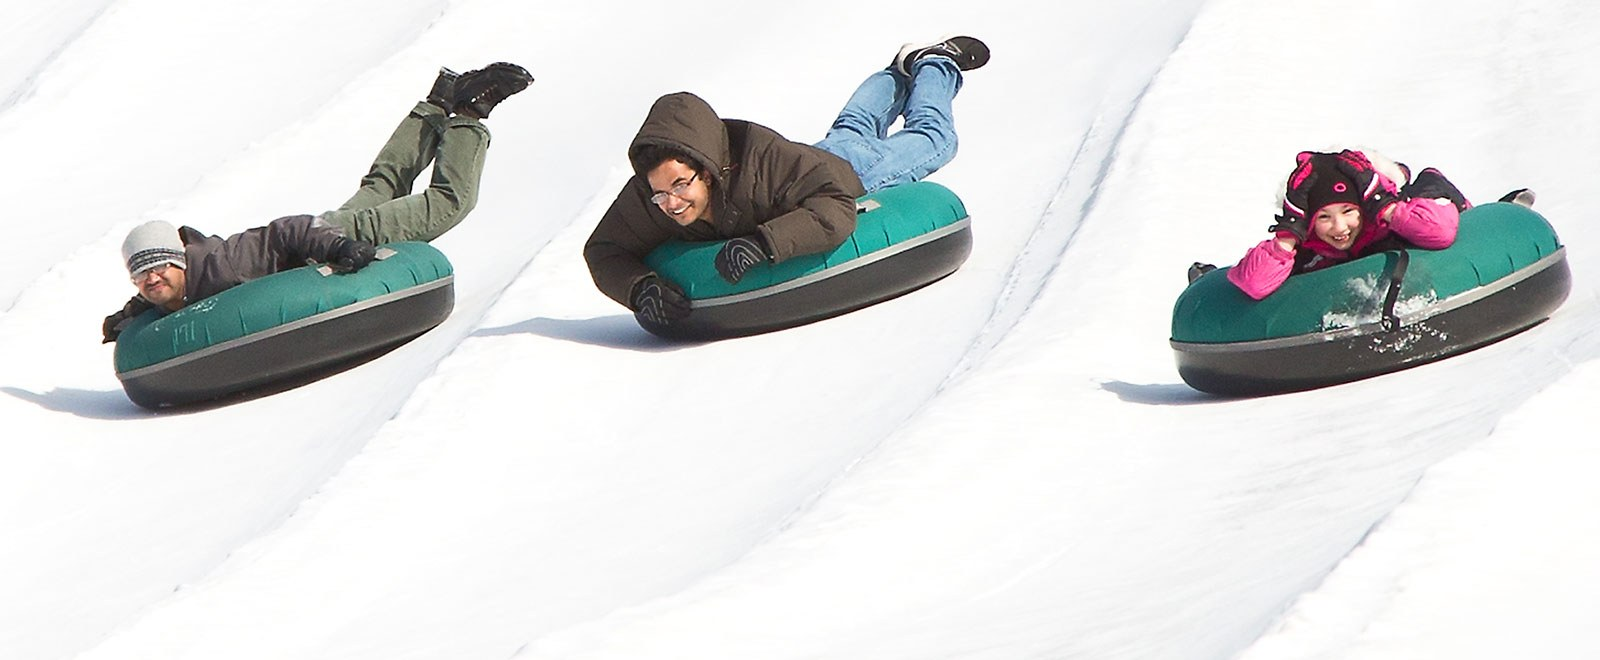 Holiday Valley Ski Resort  New York Ski Areas Vacation Get Away 58dc7ac5f63